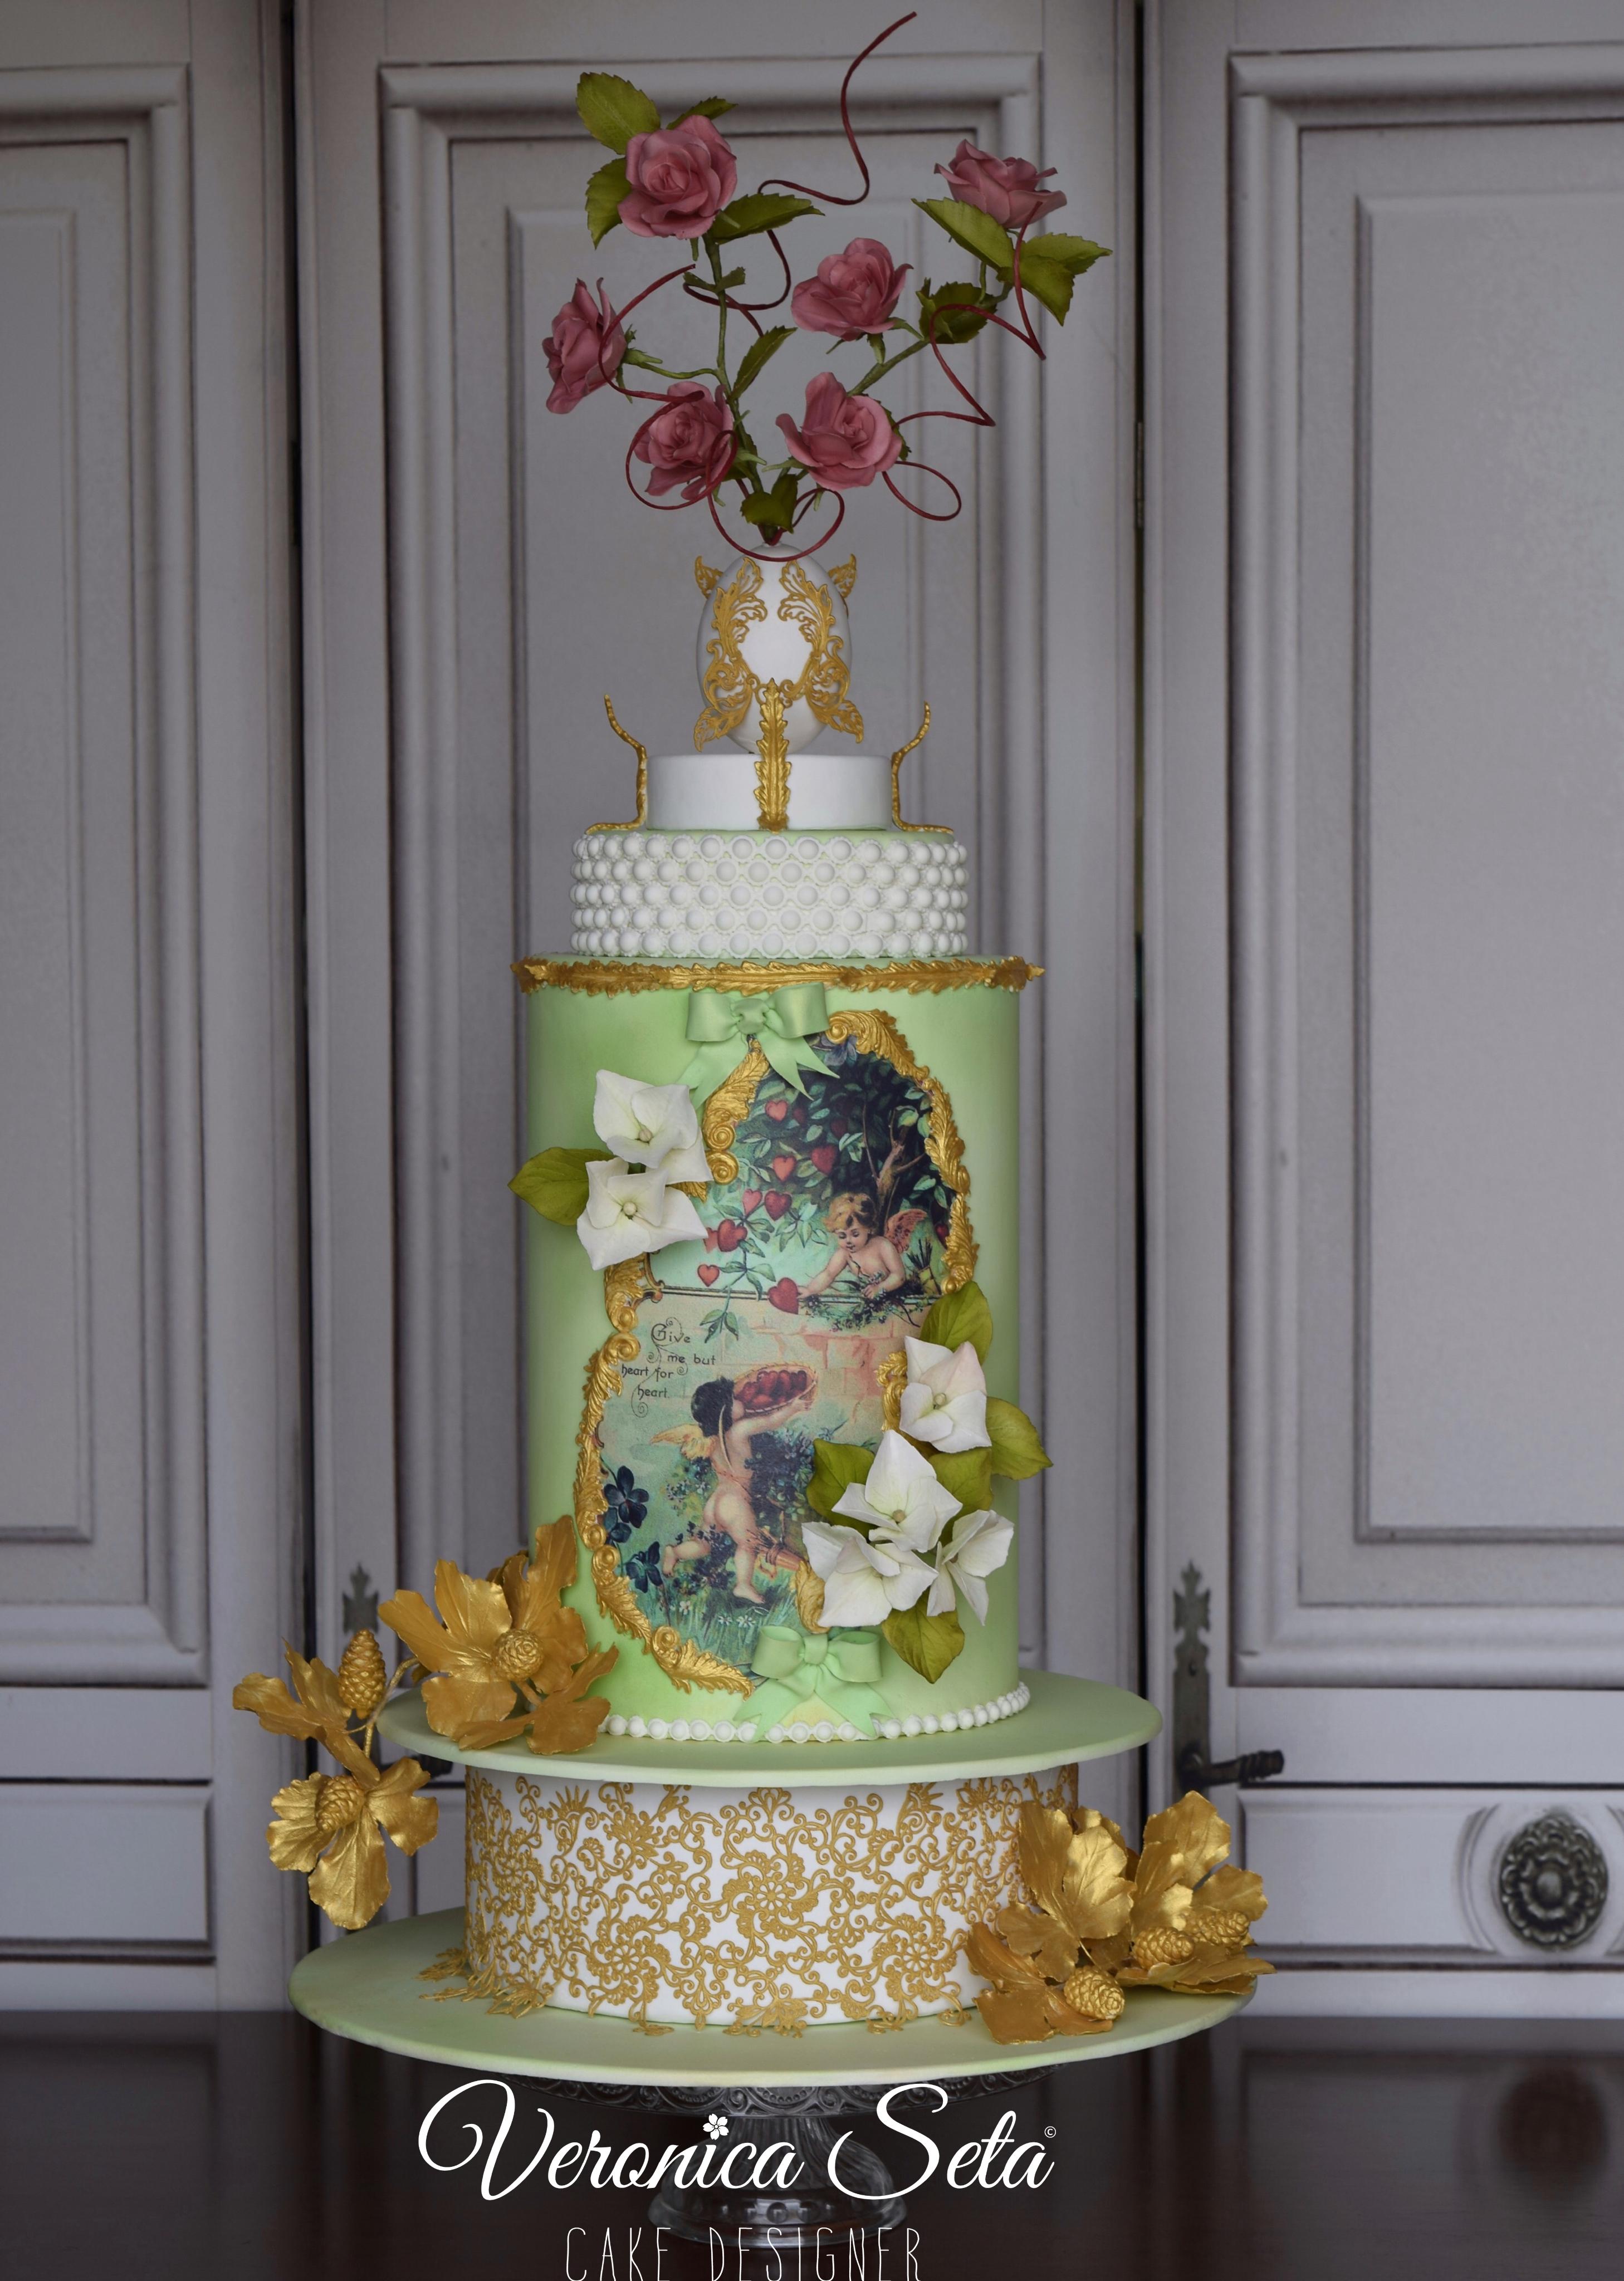 Veronica-Seta-Veronica-Seta-Cake-Designer-Wedding-Elegant-8.jpeg#asset:16147